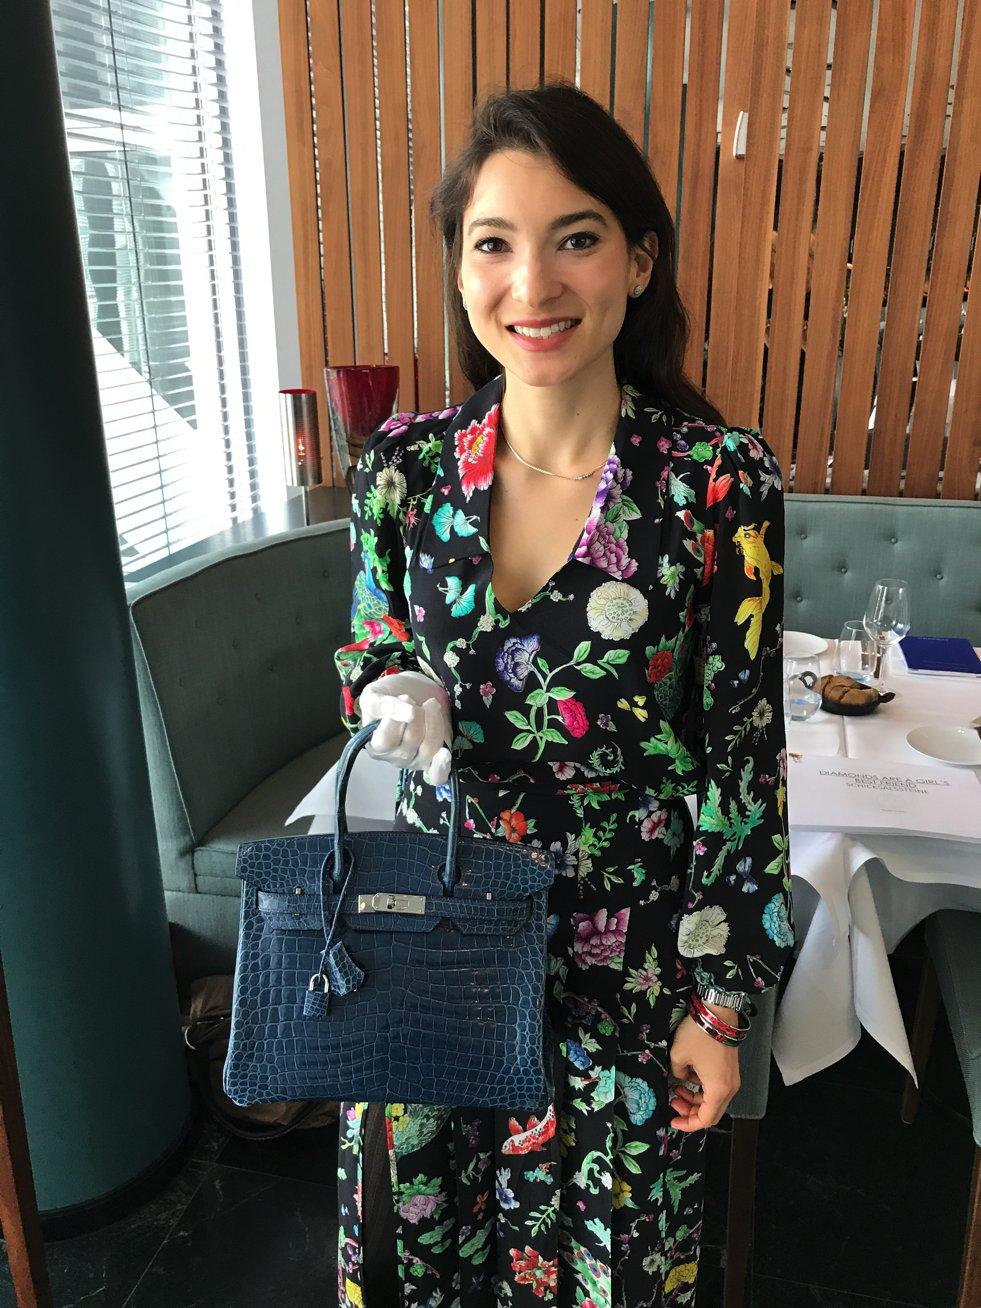 Rachel Koffsky Christie´s, Chrsties´s Ladies Lunch Phoenix Restaurant, Lifestyle.-Blog, Lieblingsstil.com,